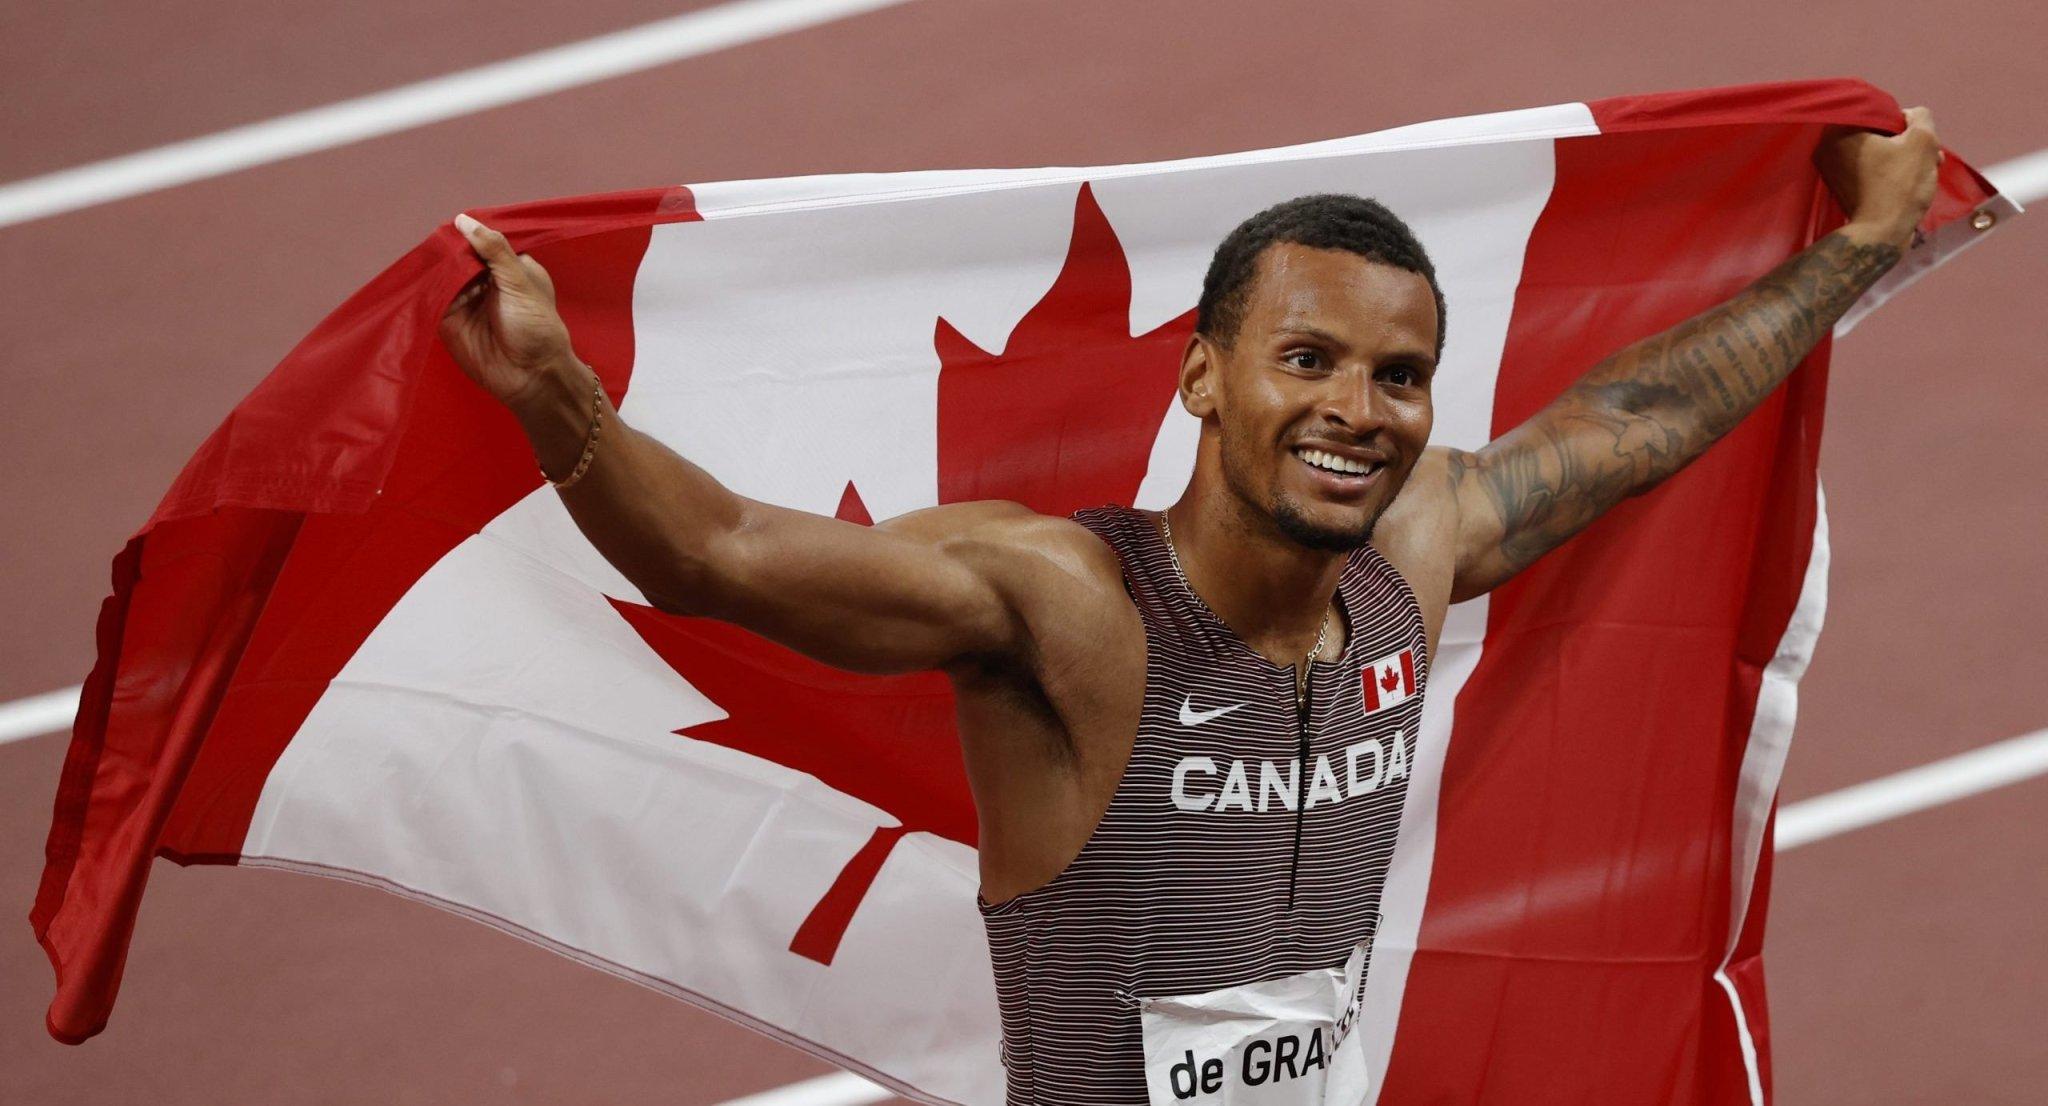 Olympics-Athletics-Canadian De Grasse ends long wait for gold